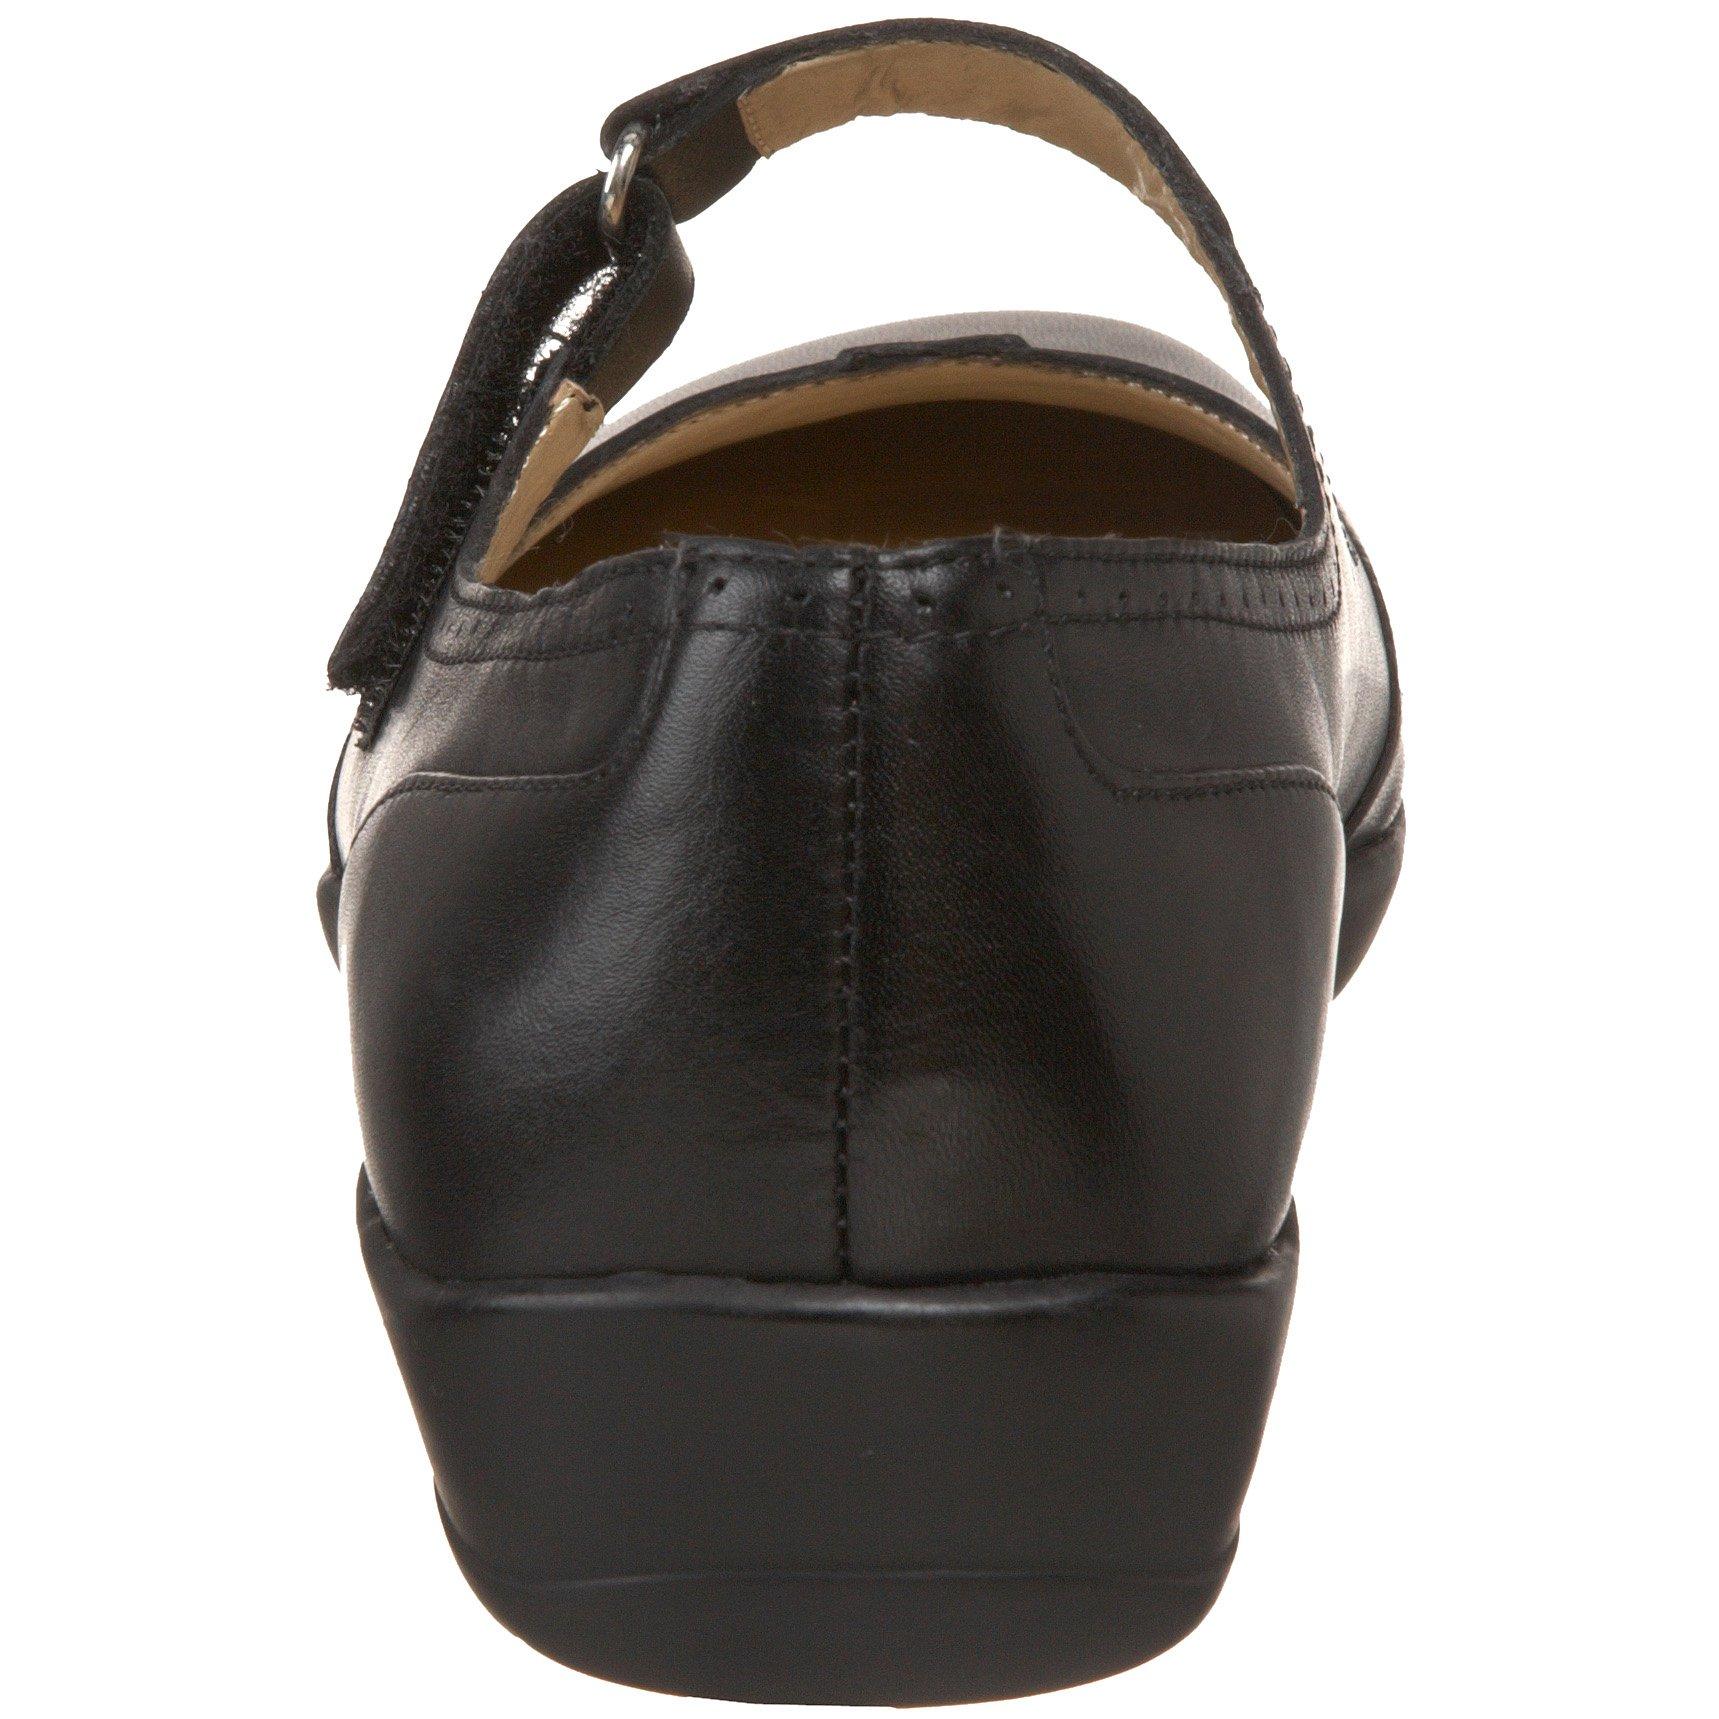 Drew Shoe Women's Isabel Mary Jane,Black Leather,6 W US by Drew Shoe (Image #2)